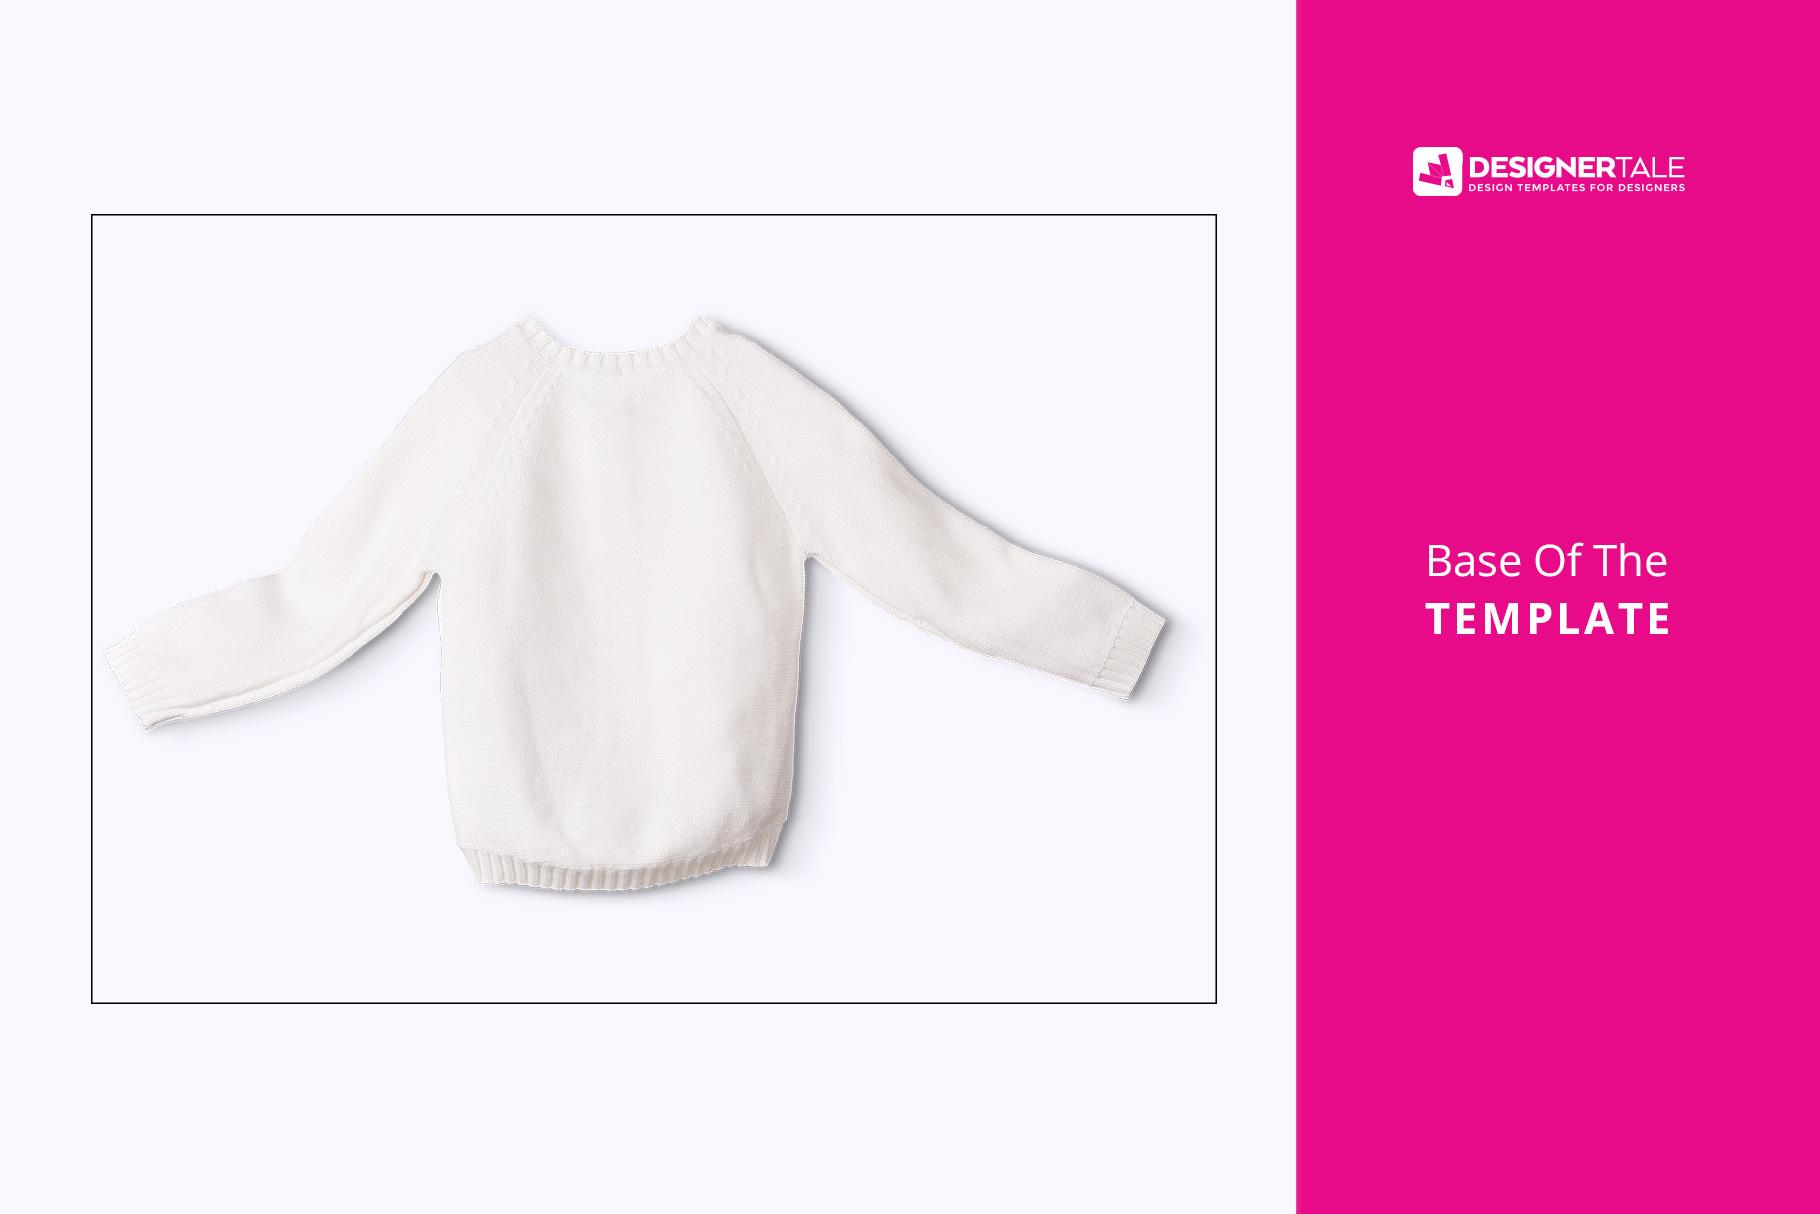 base image of the knitted kids jumper mockup